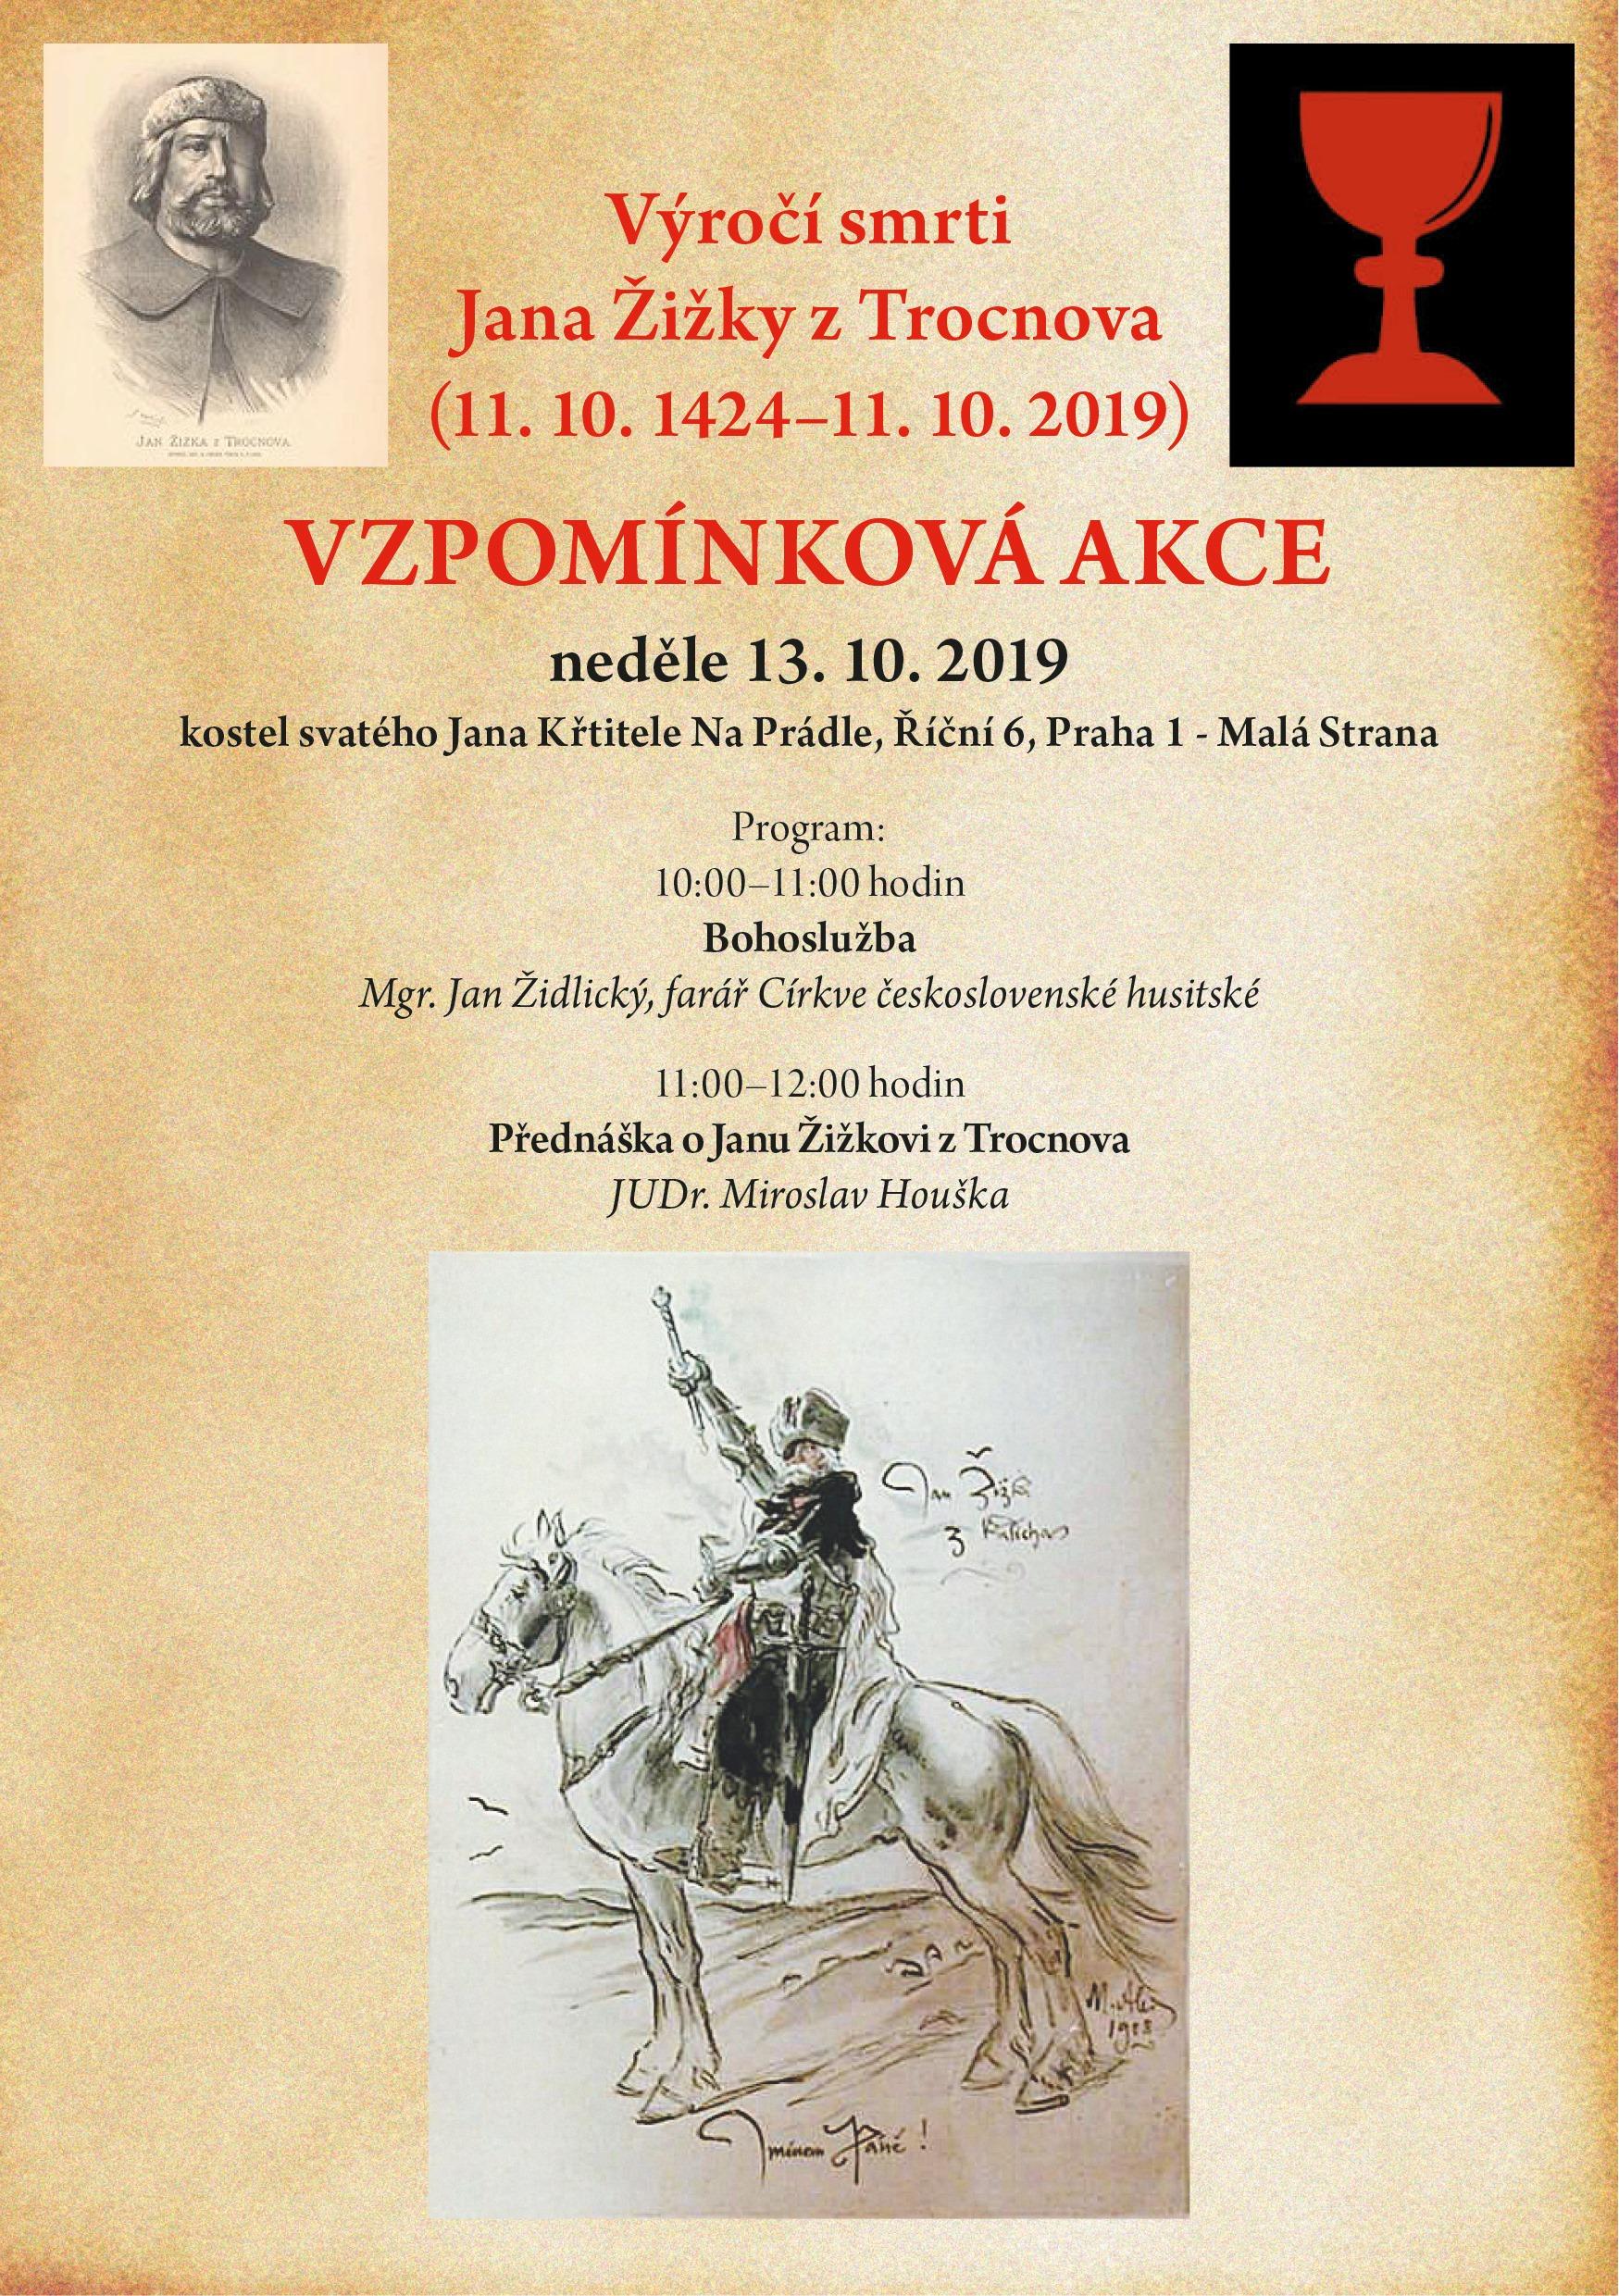 neděle 13.10.2019 po bohoslužbě přednáška mgr. Miroslava Houšky o Janu Žižkovi z Trocnova